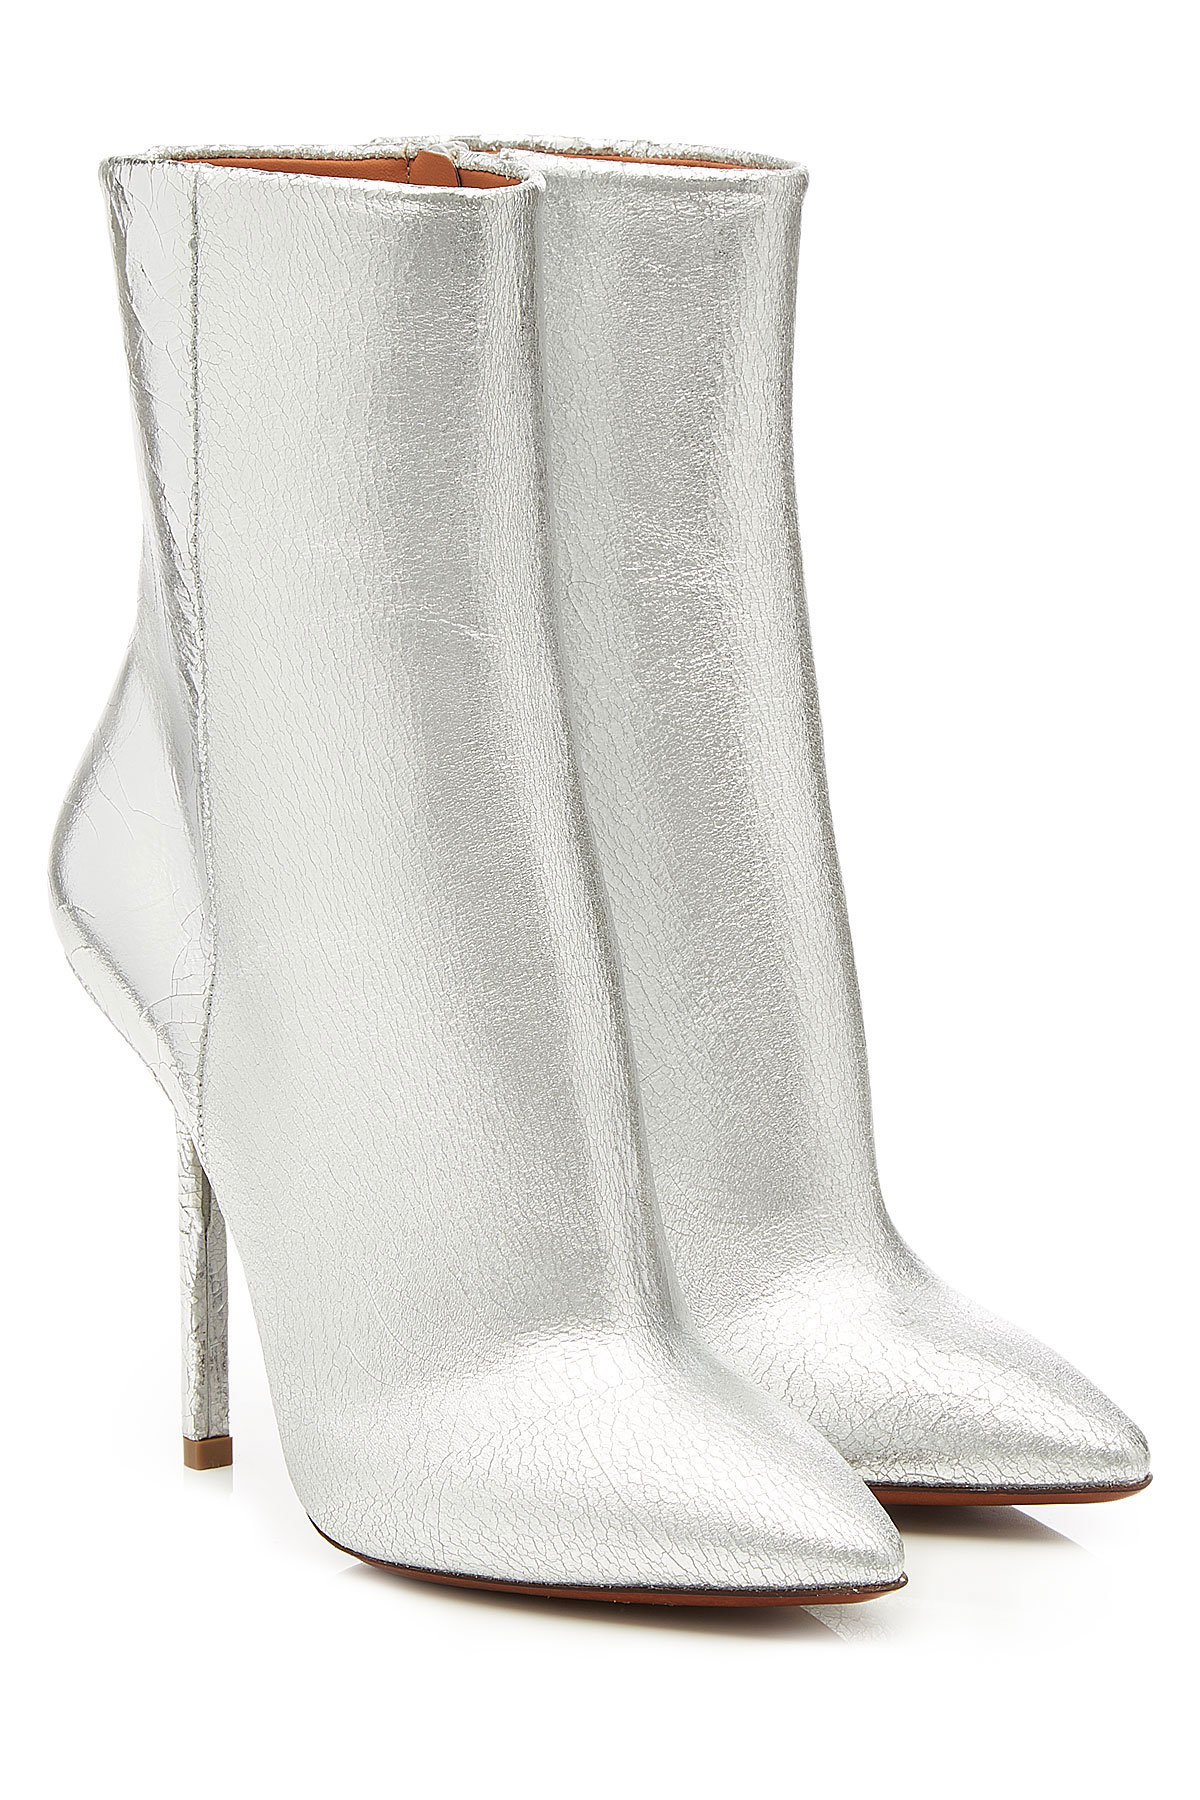 Vetements Metallic Leather Ankle Boots Gr. IT 40 fzBdxX8